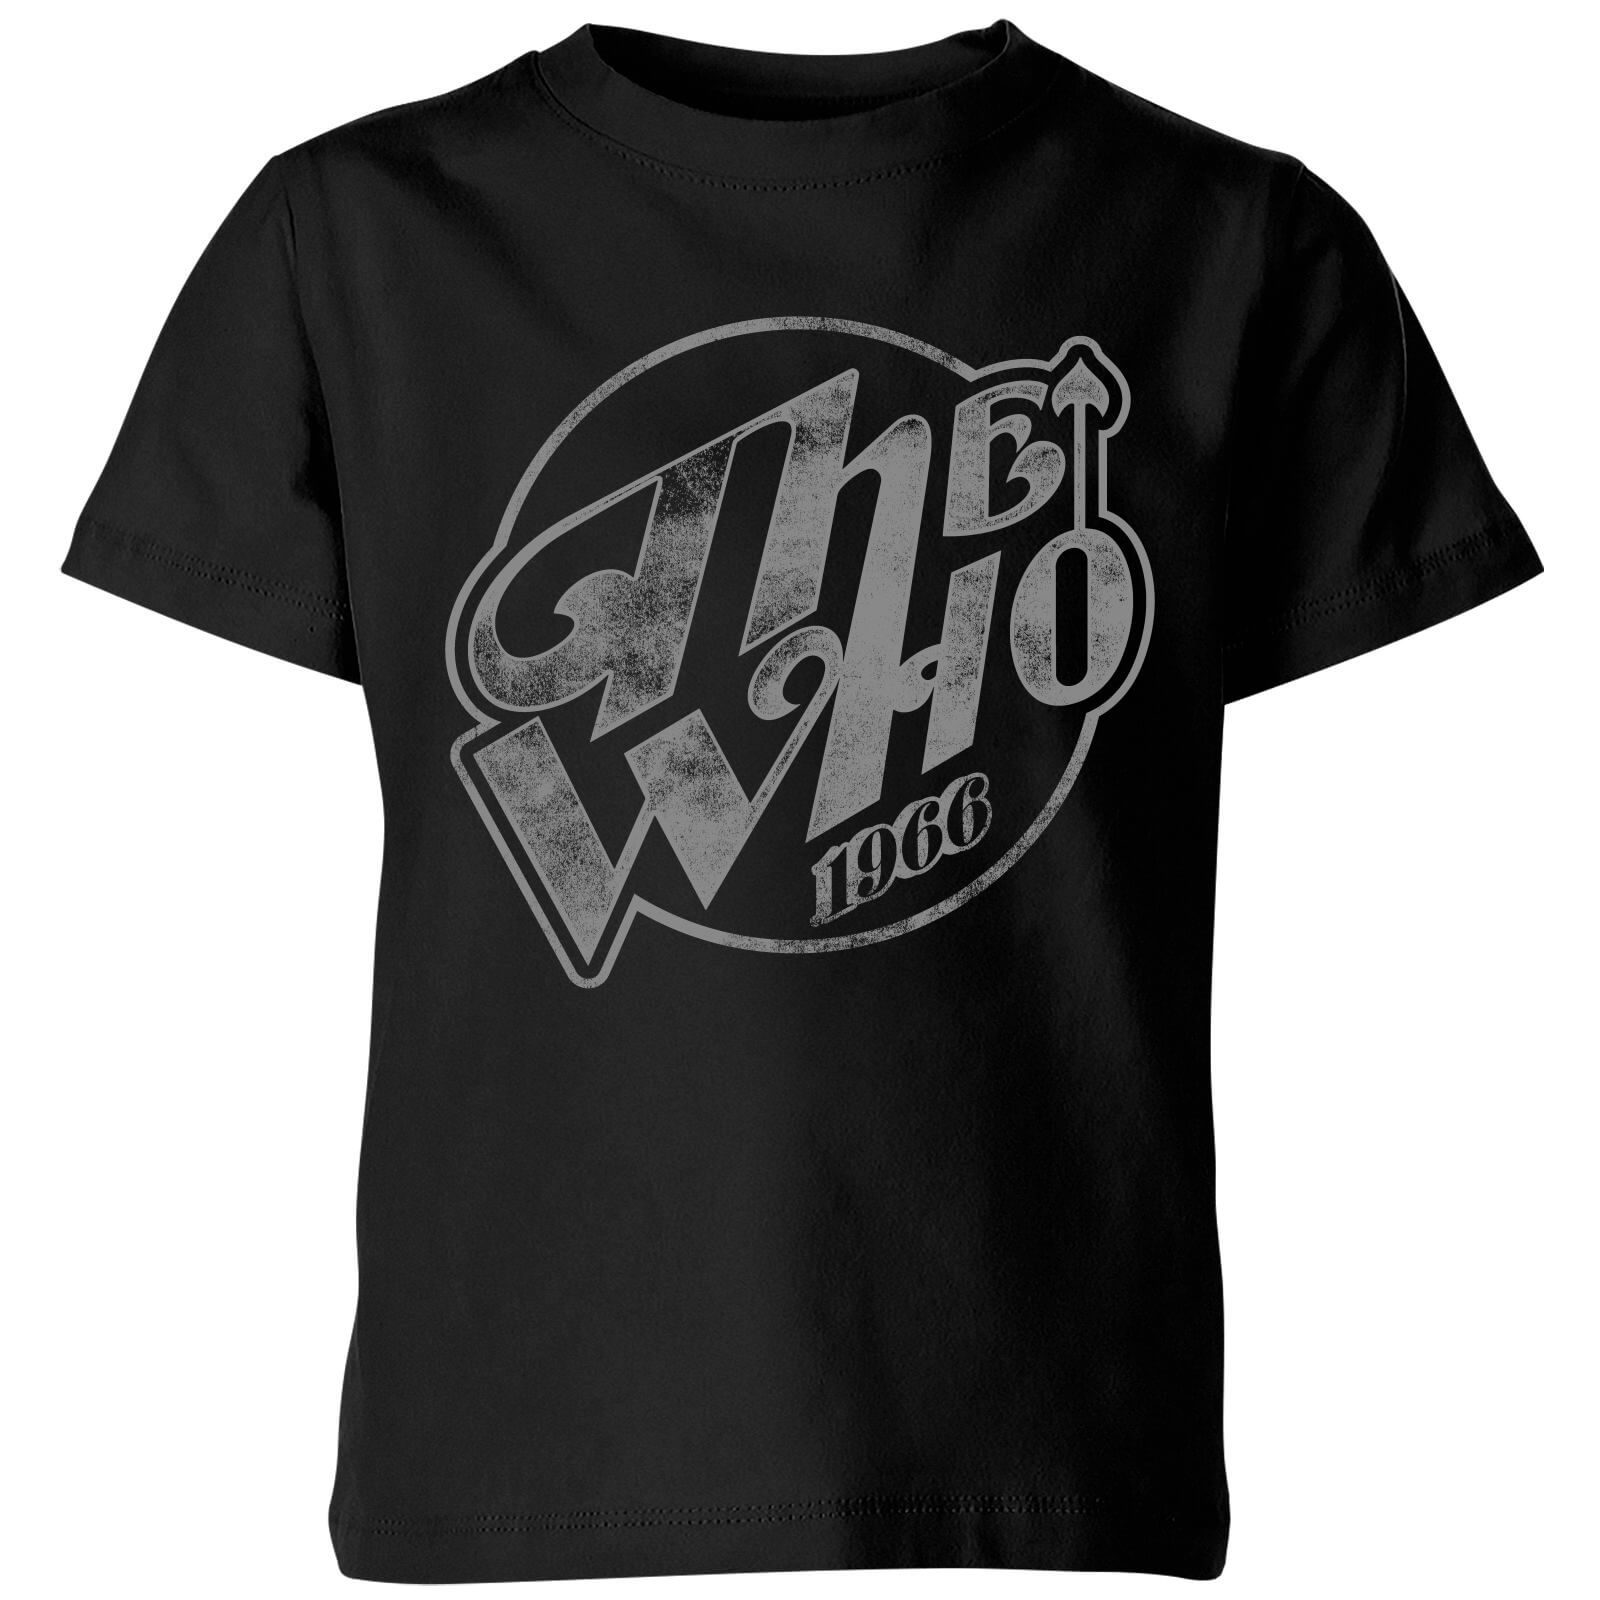 The Who 1966 Kids' T-Shirt - Black